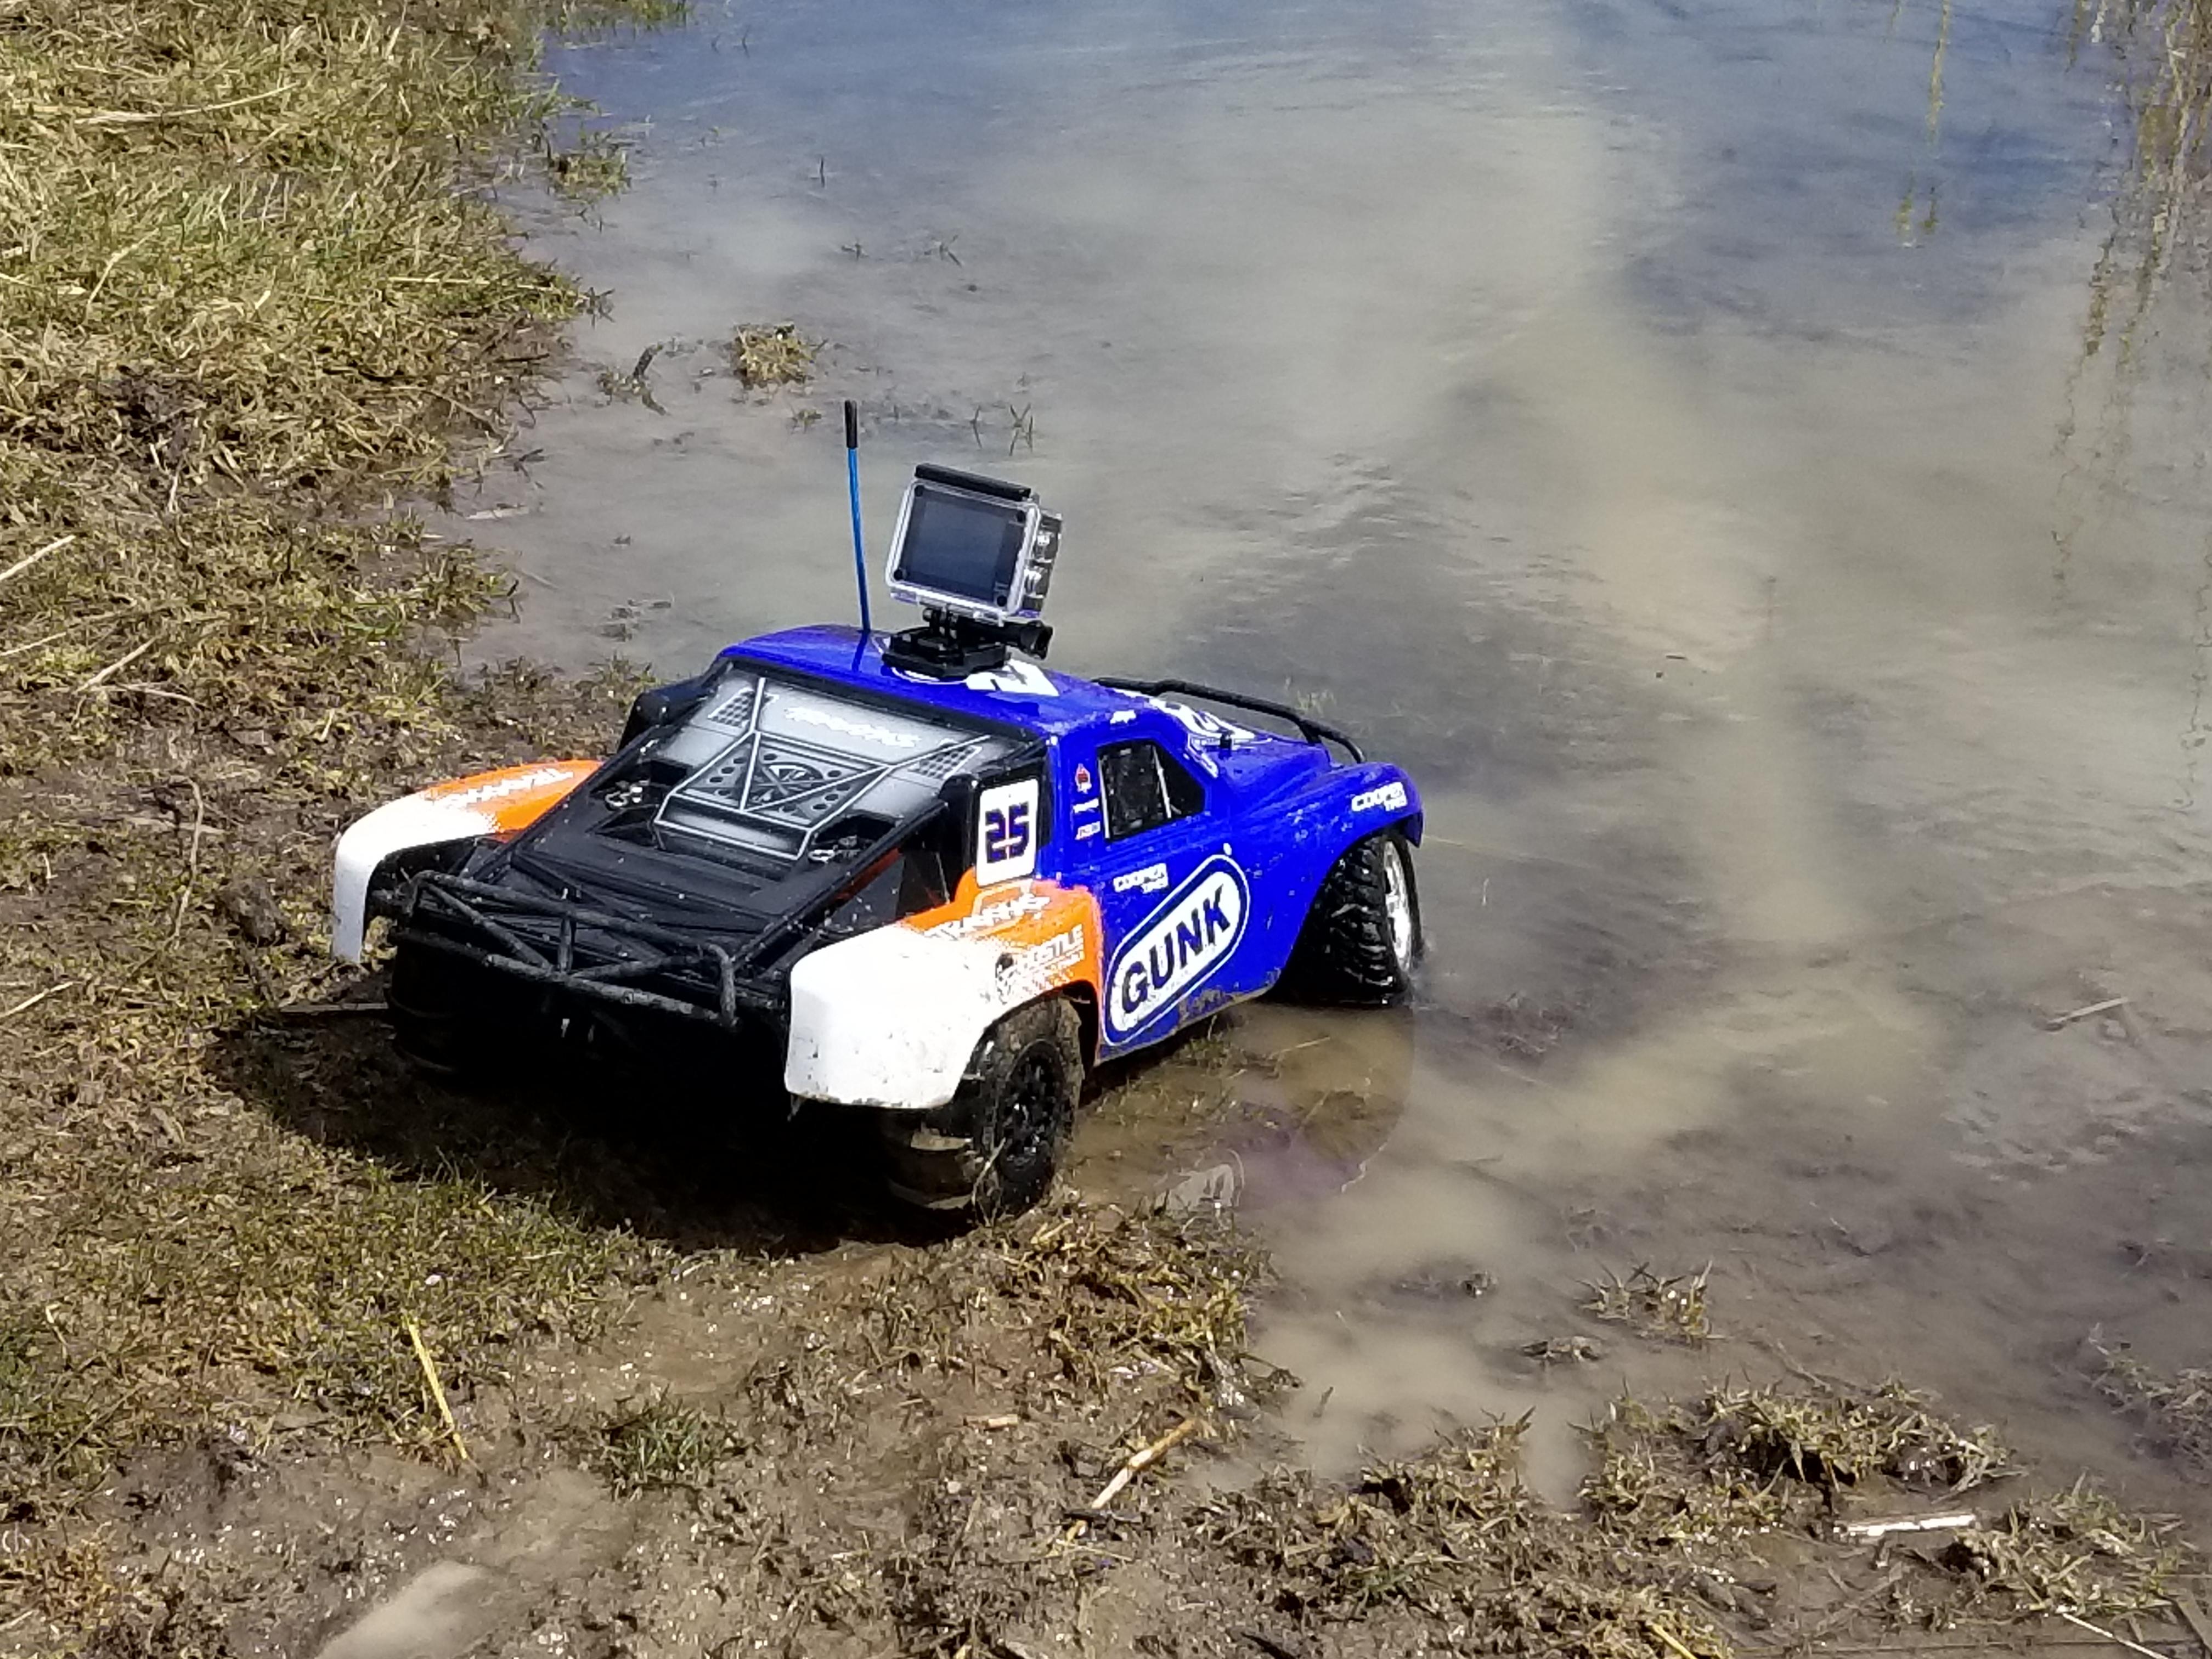 RC car going through mud